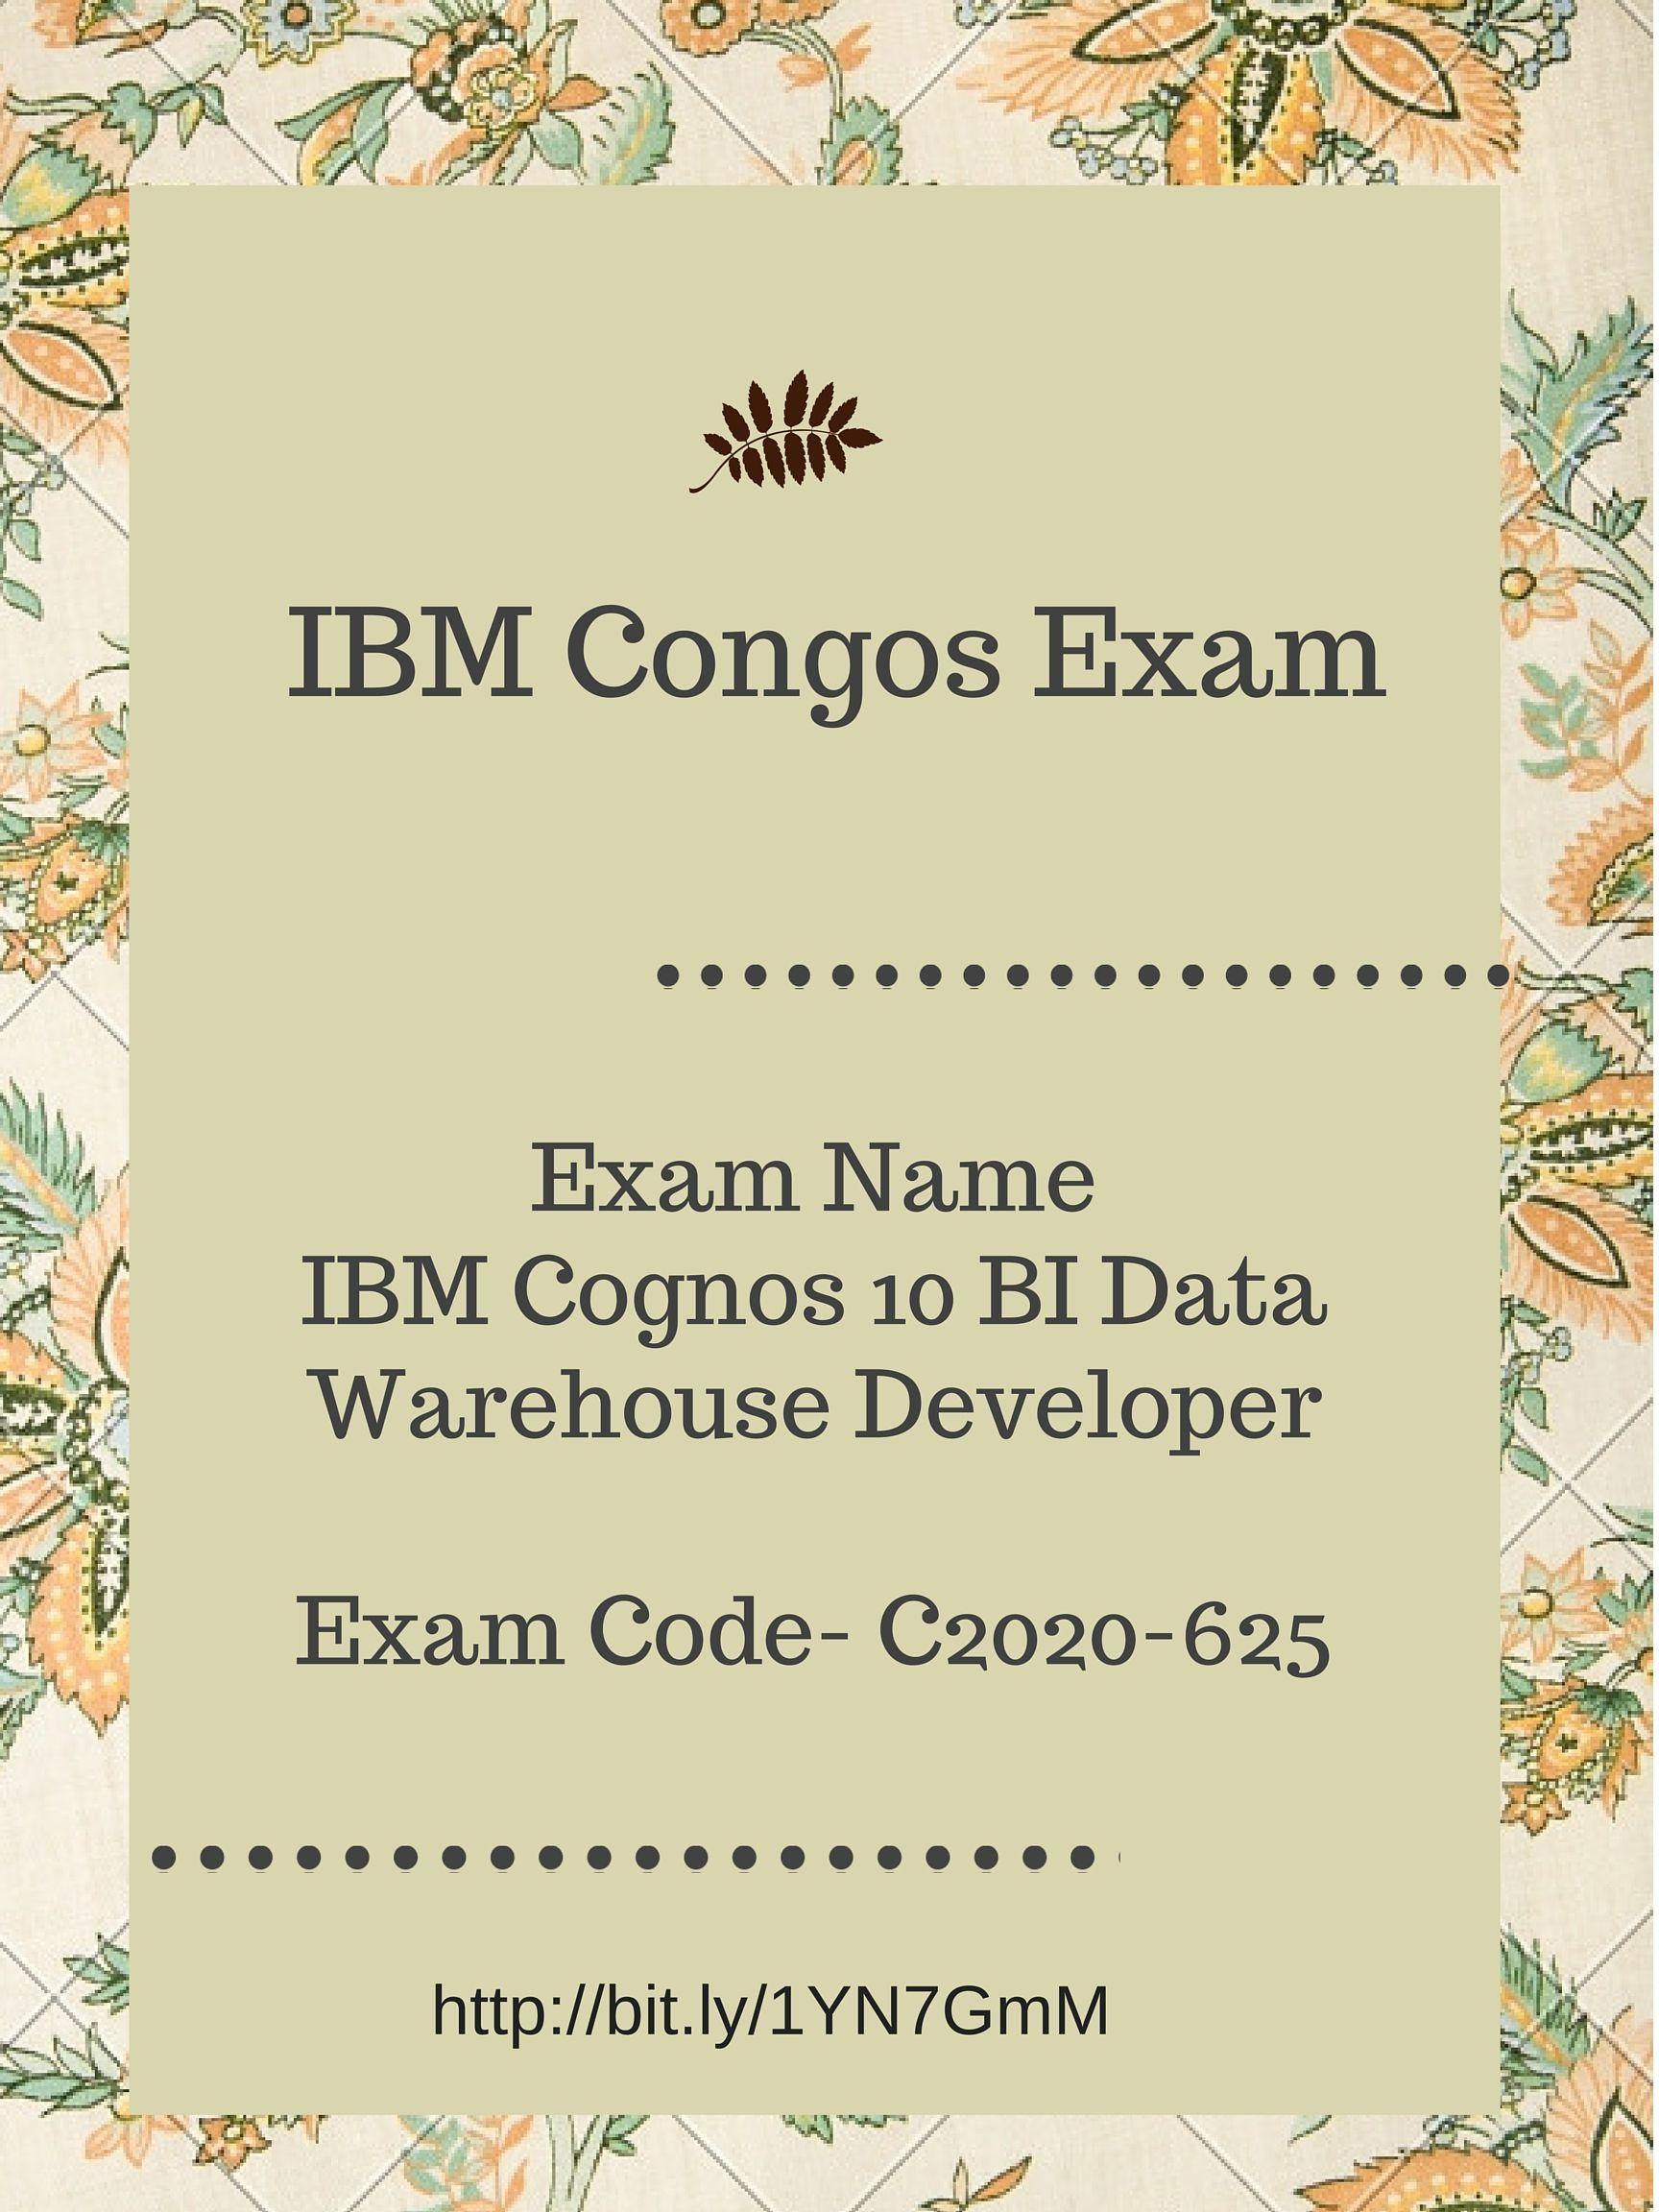 Exam Name Ibm Cognos 10 Bi Data Warehouse Developer Exam Code C2020